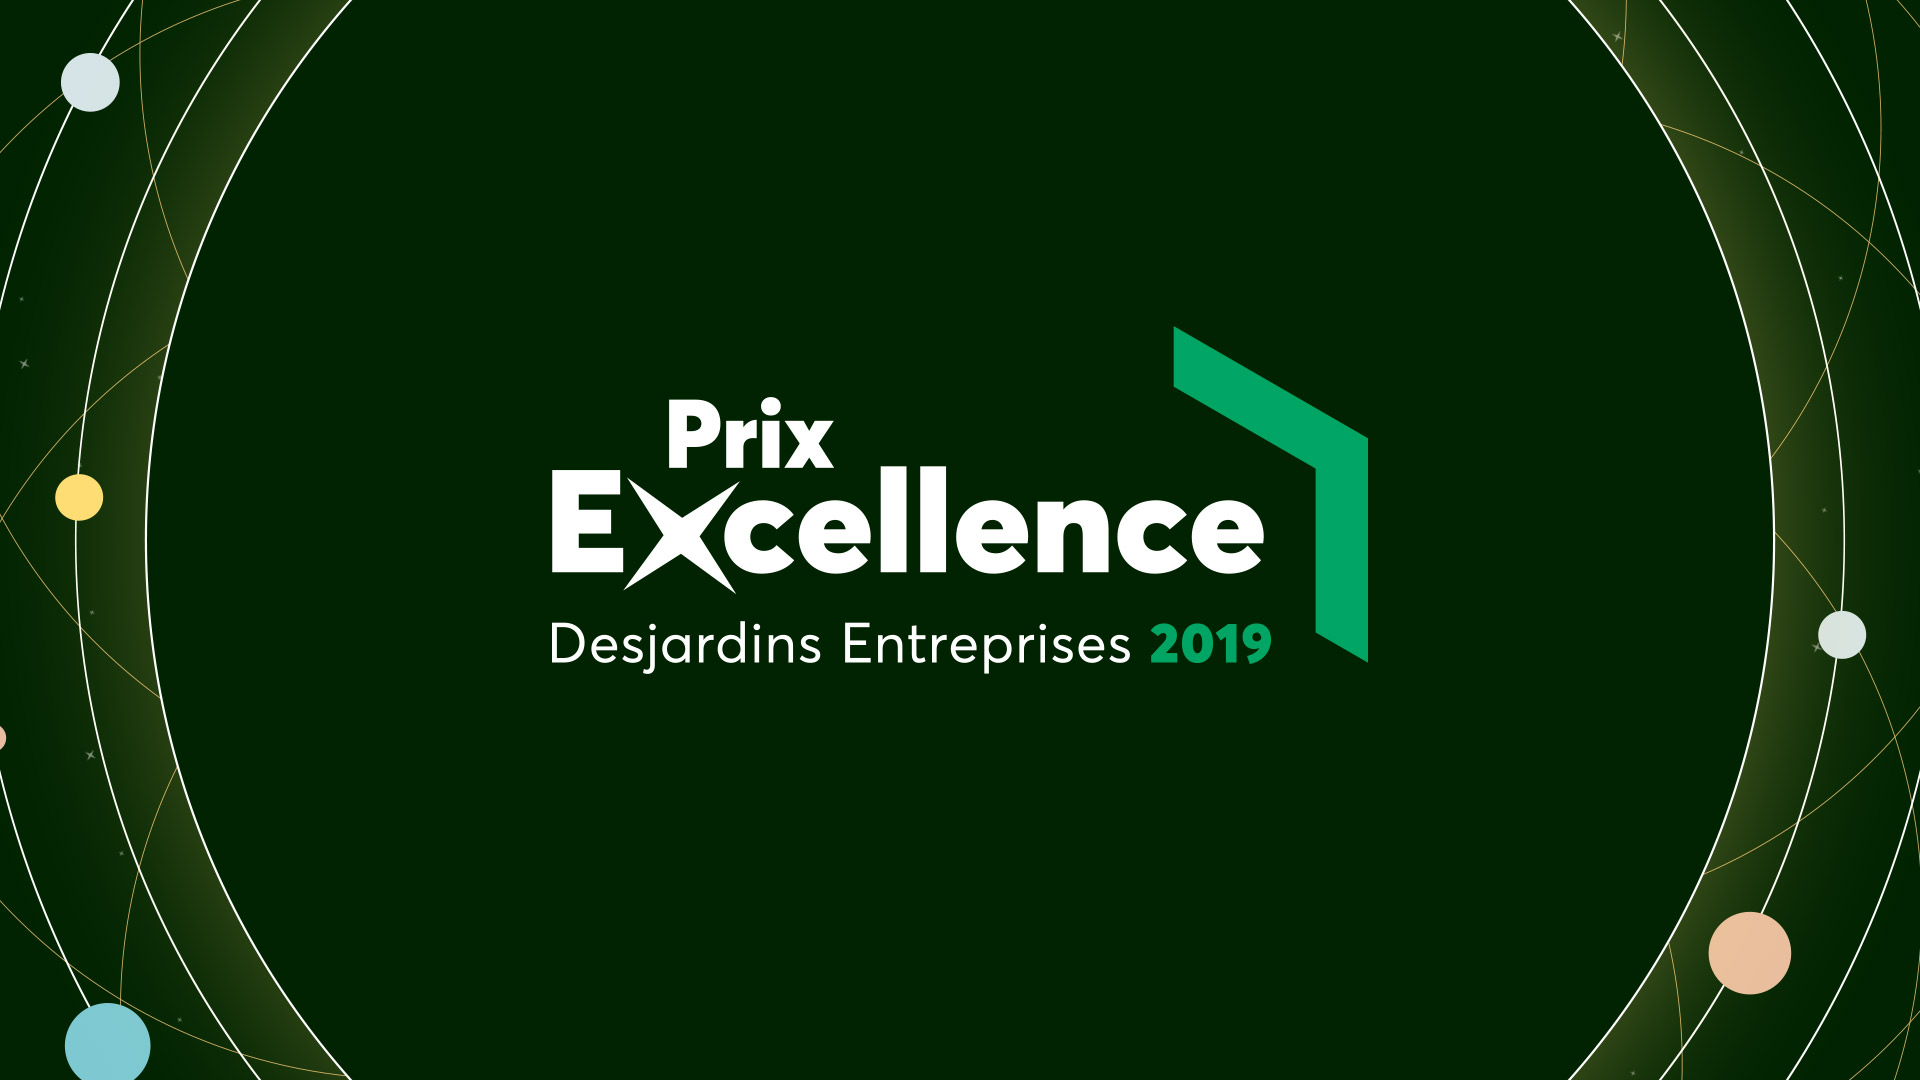 Desjardins – Prix Excellence 2019